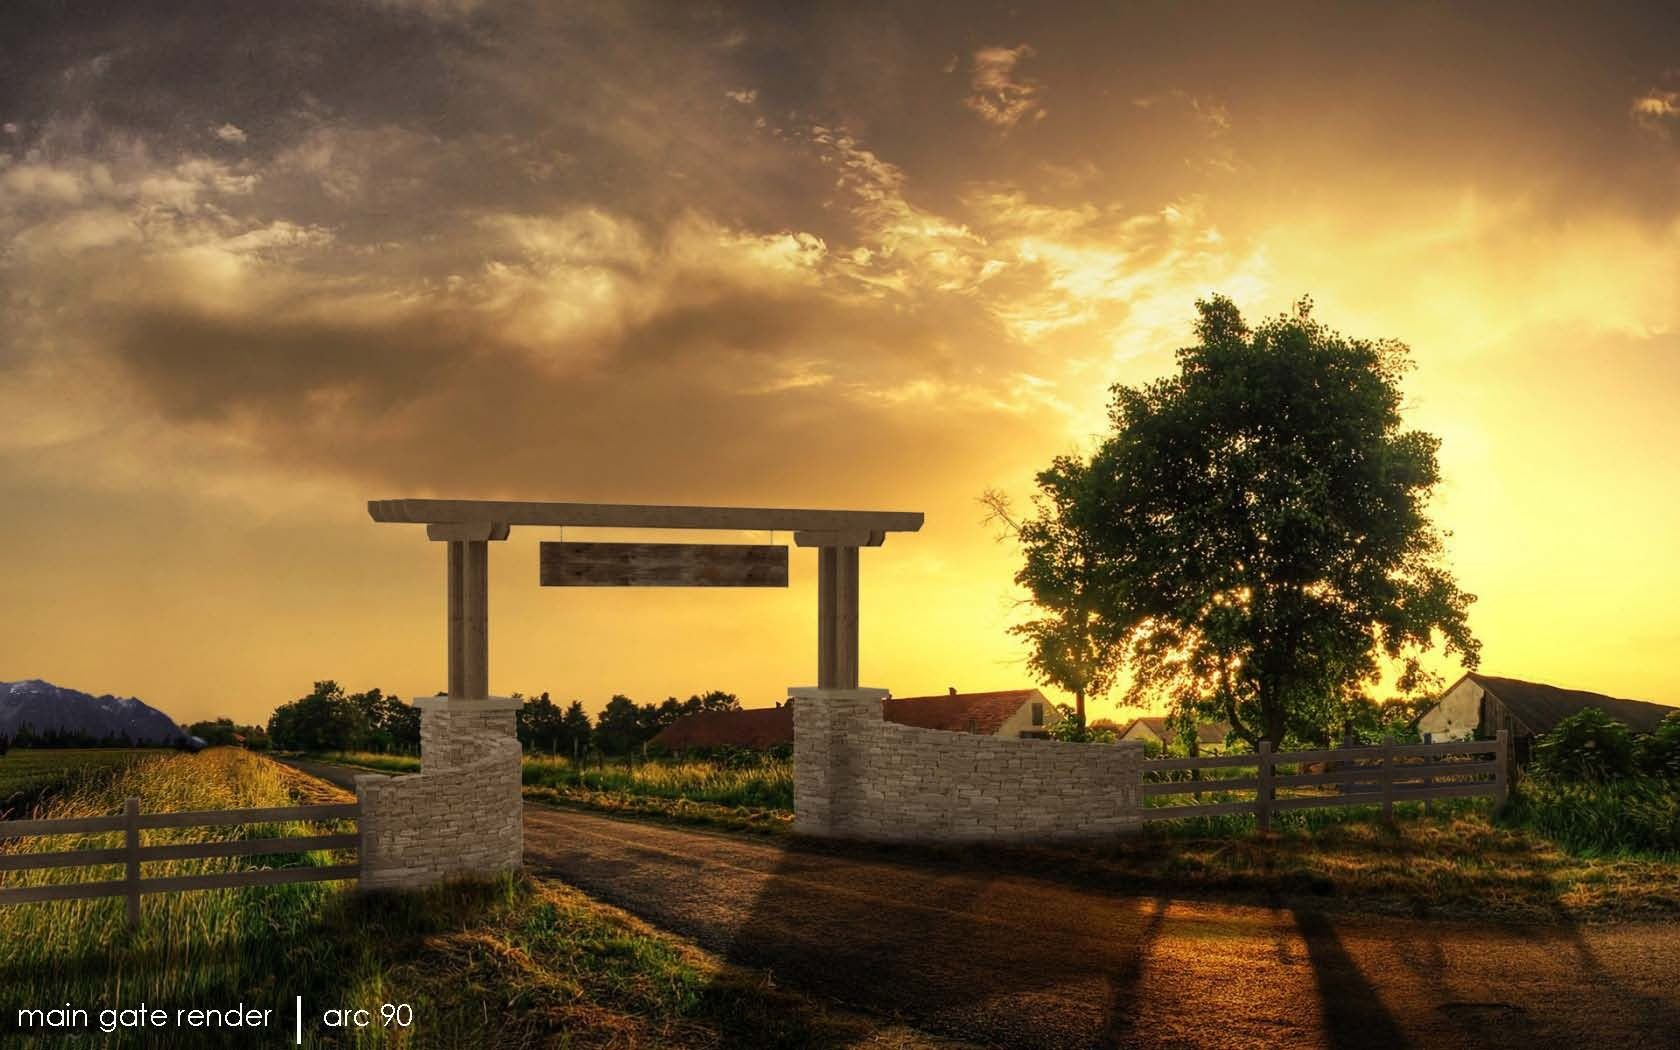 Barn Design Project designed by David Heaton Ranch Entry